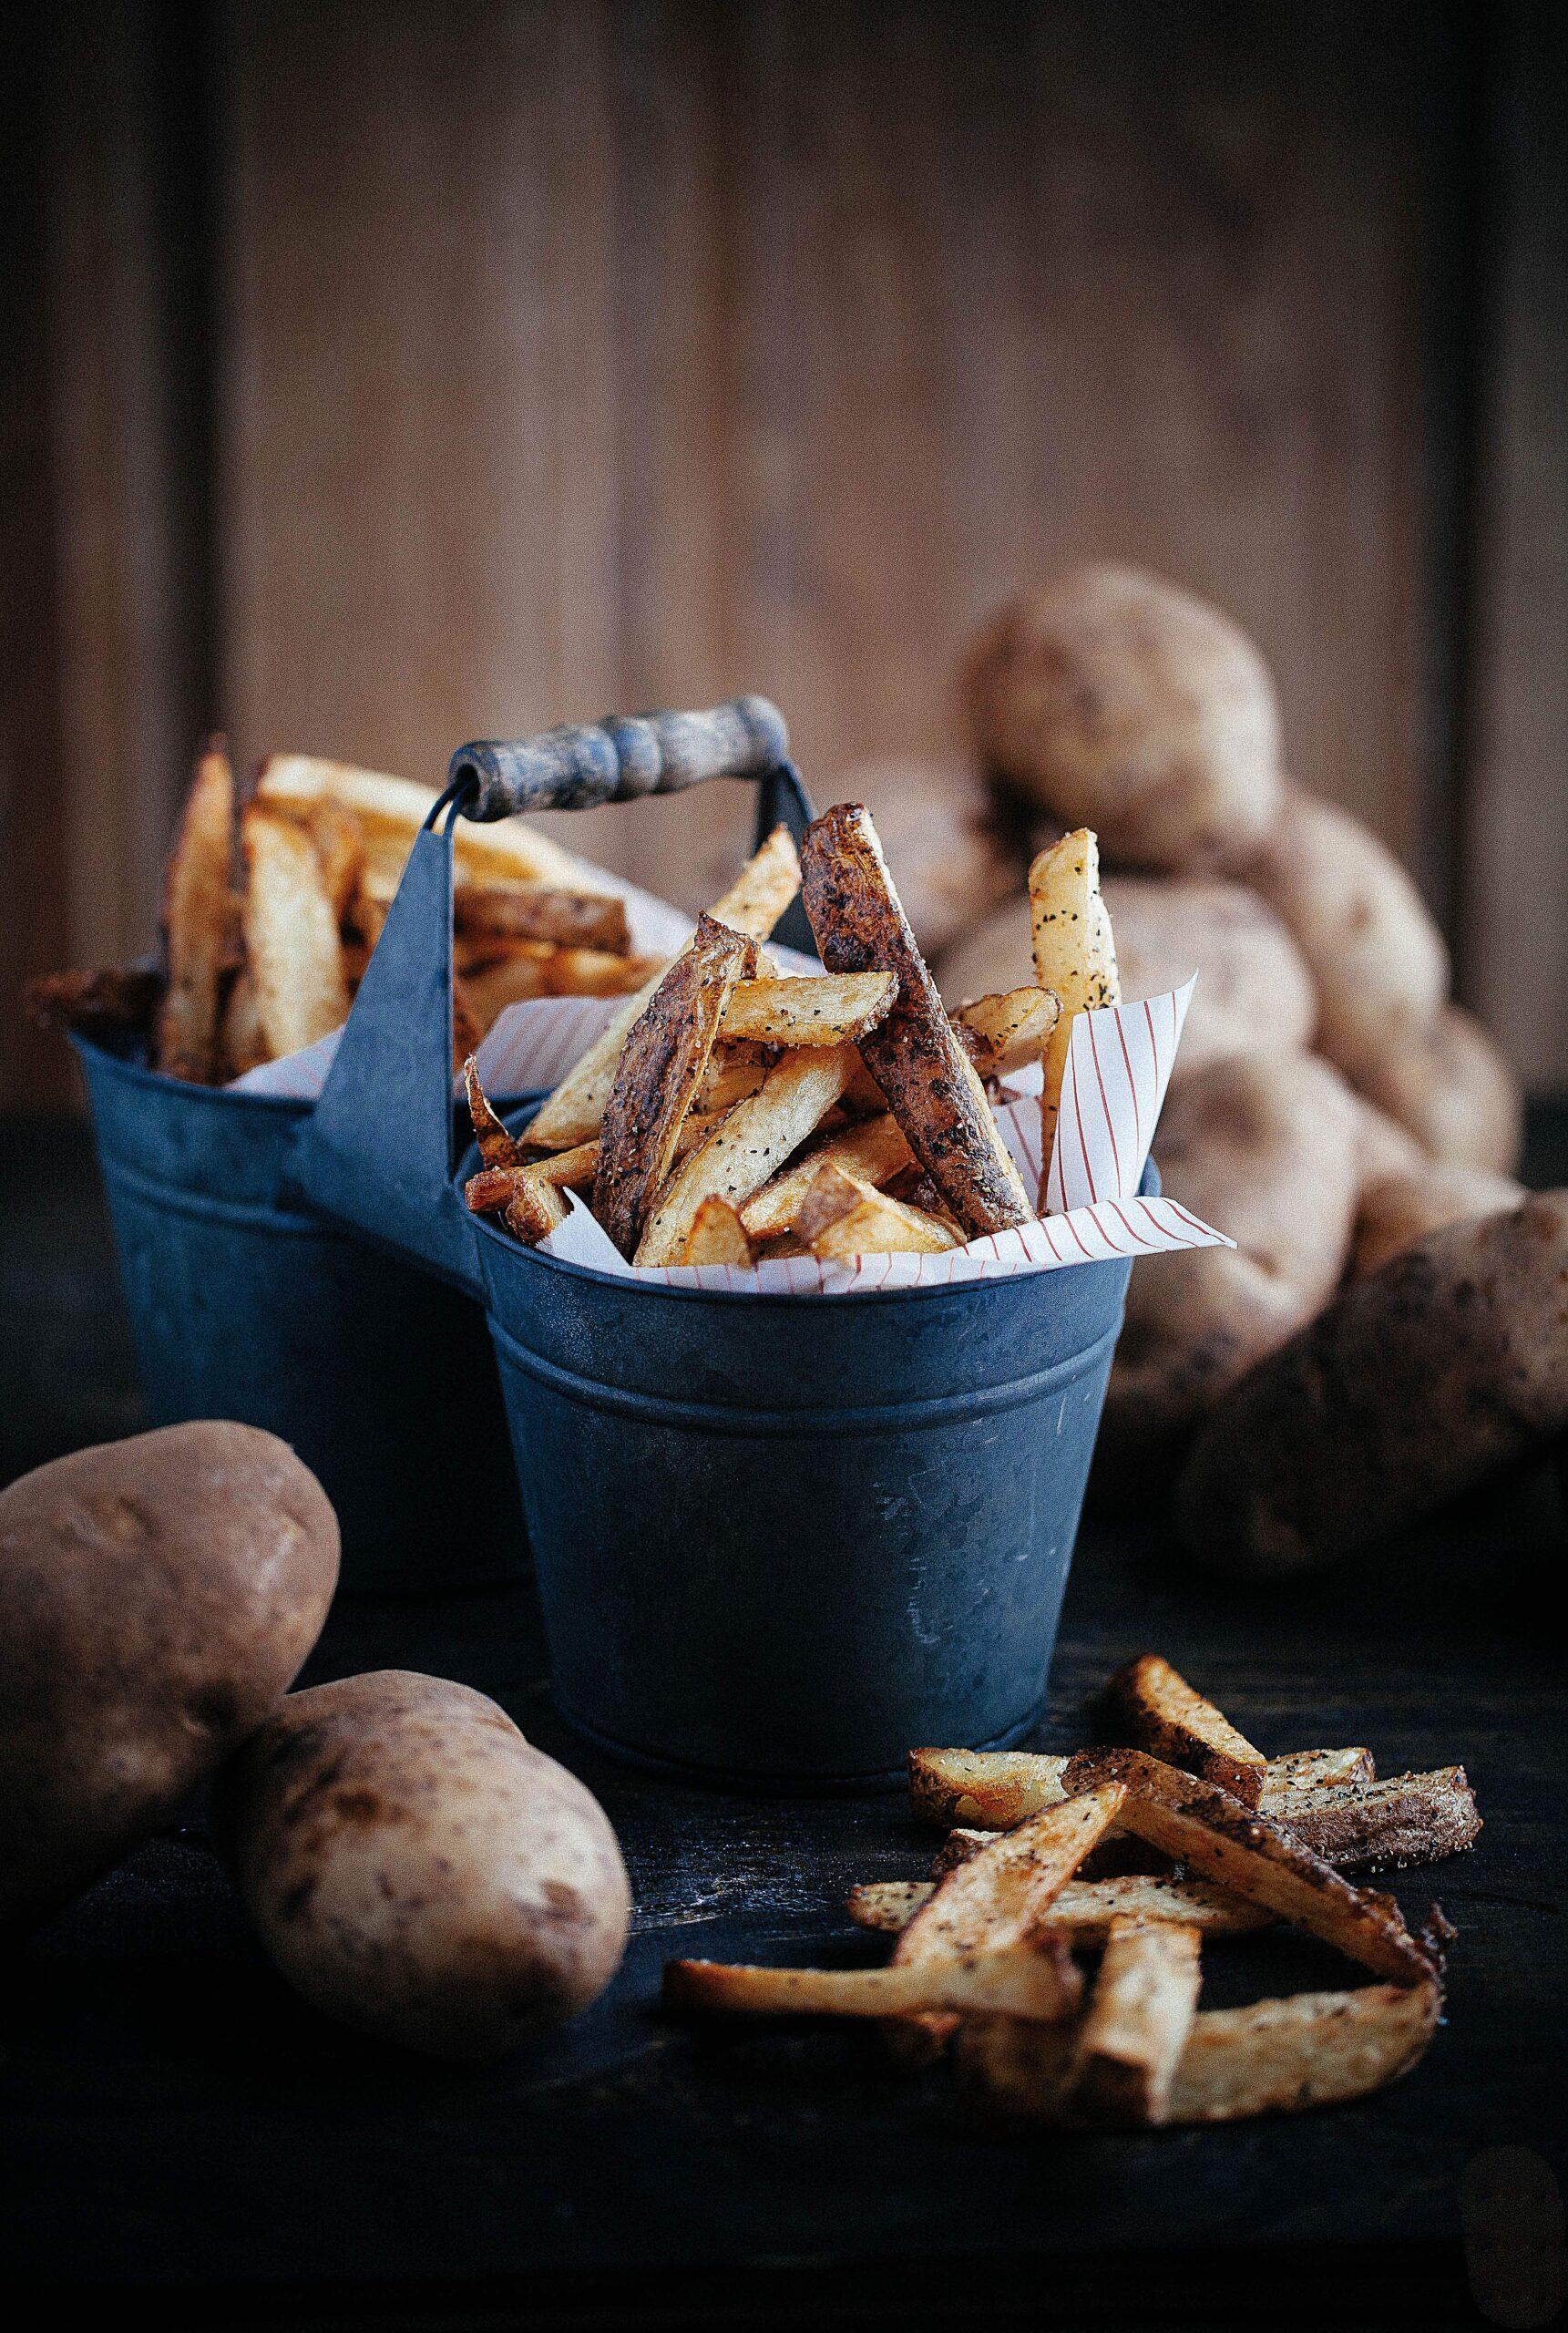 fries with potato skin